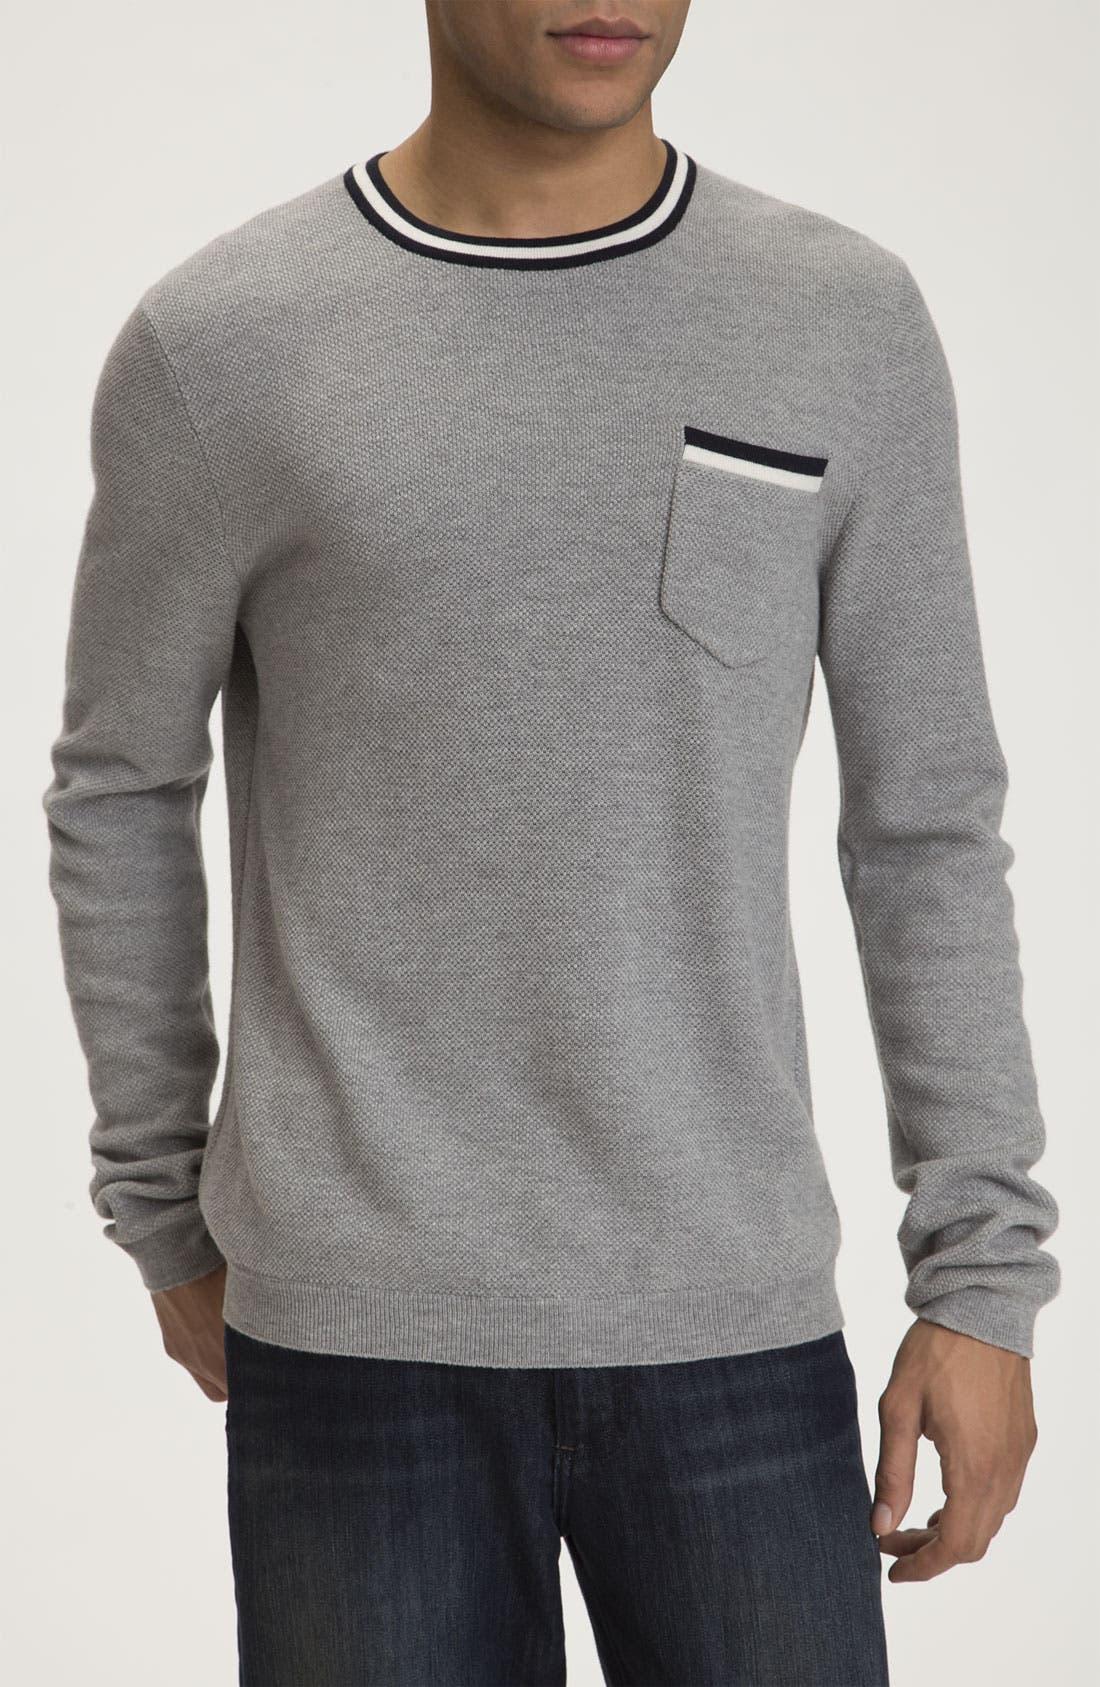 Alternate Image 1 Selected - rag & bone 'Franklin' Crewneck Sweater